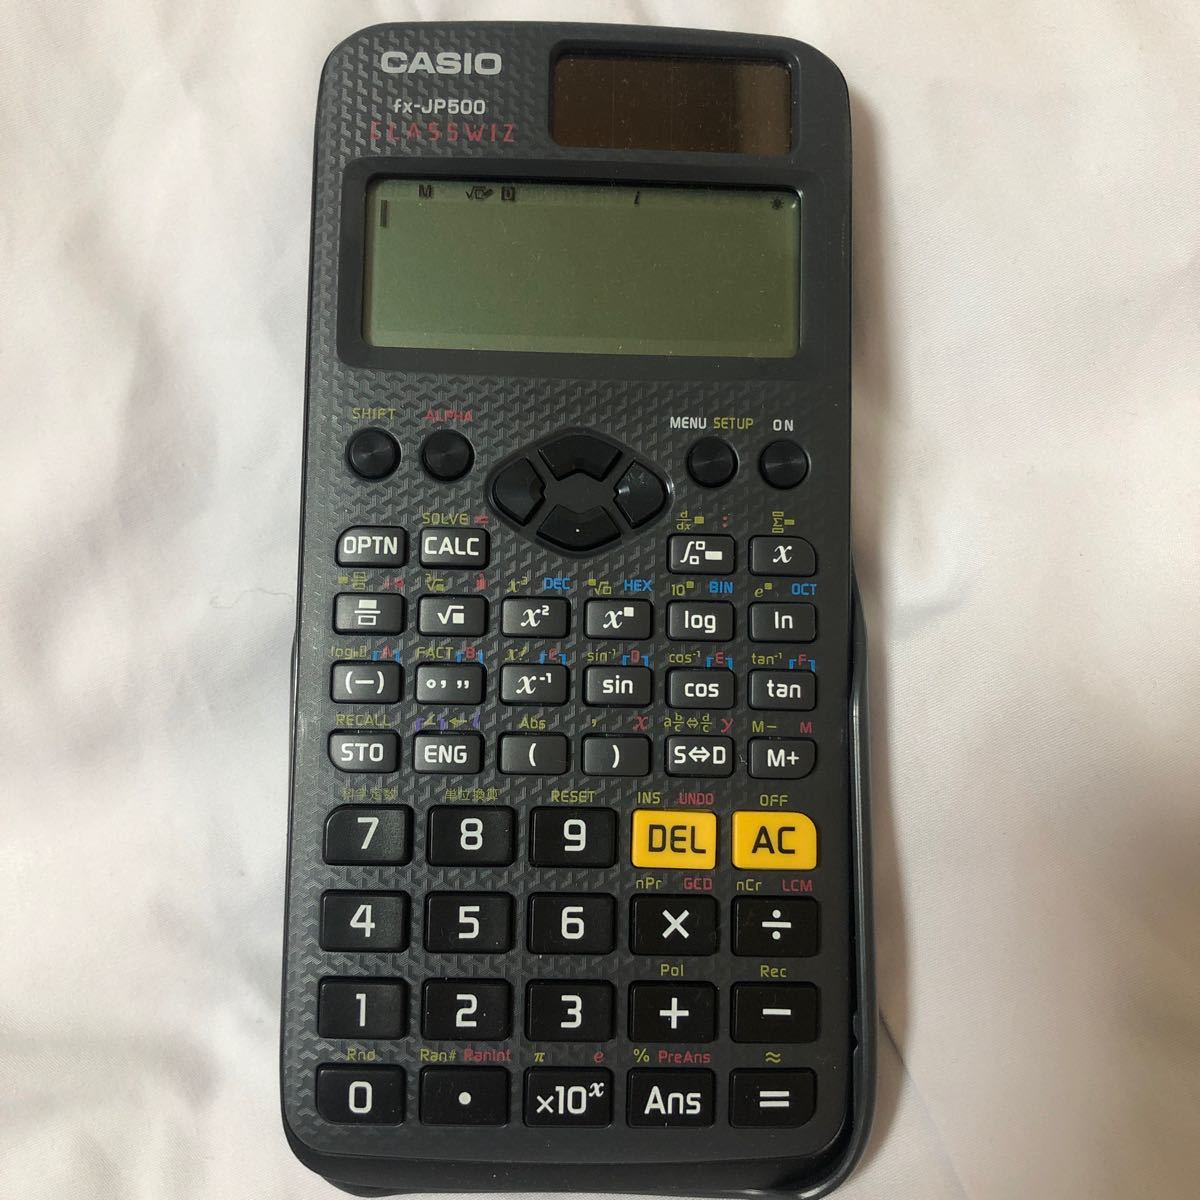 CASIO 関数電卓 FX-JP500 カシオ関数電卓 カシオ